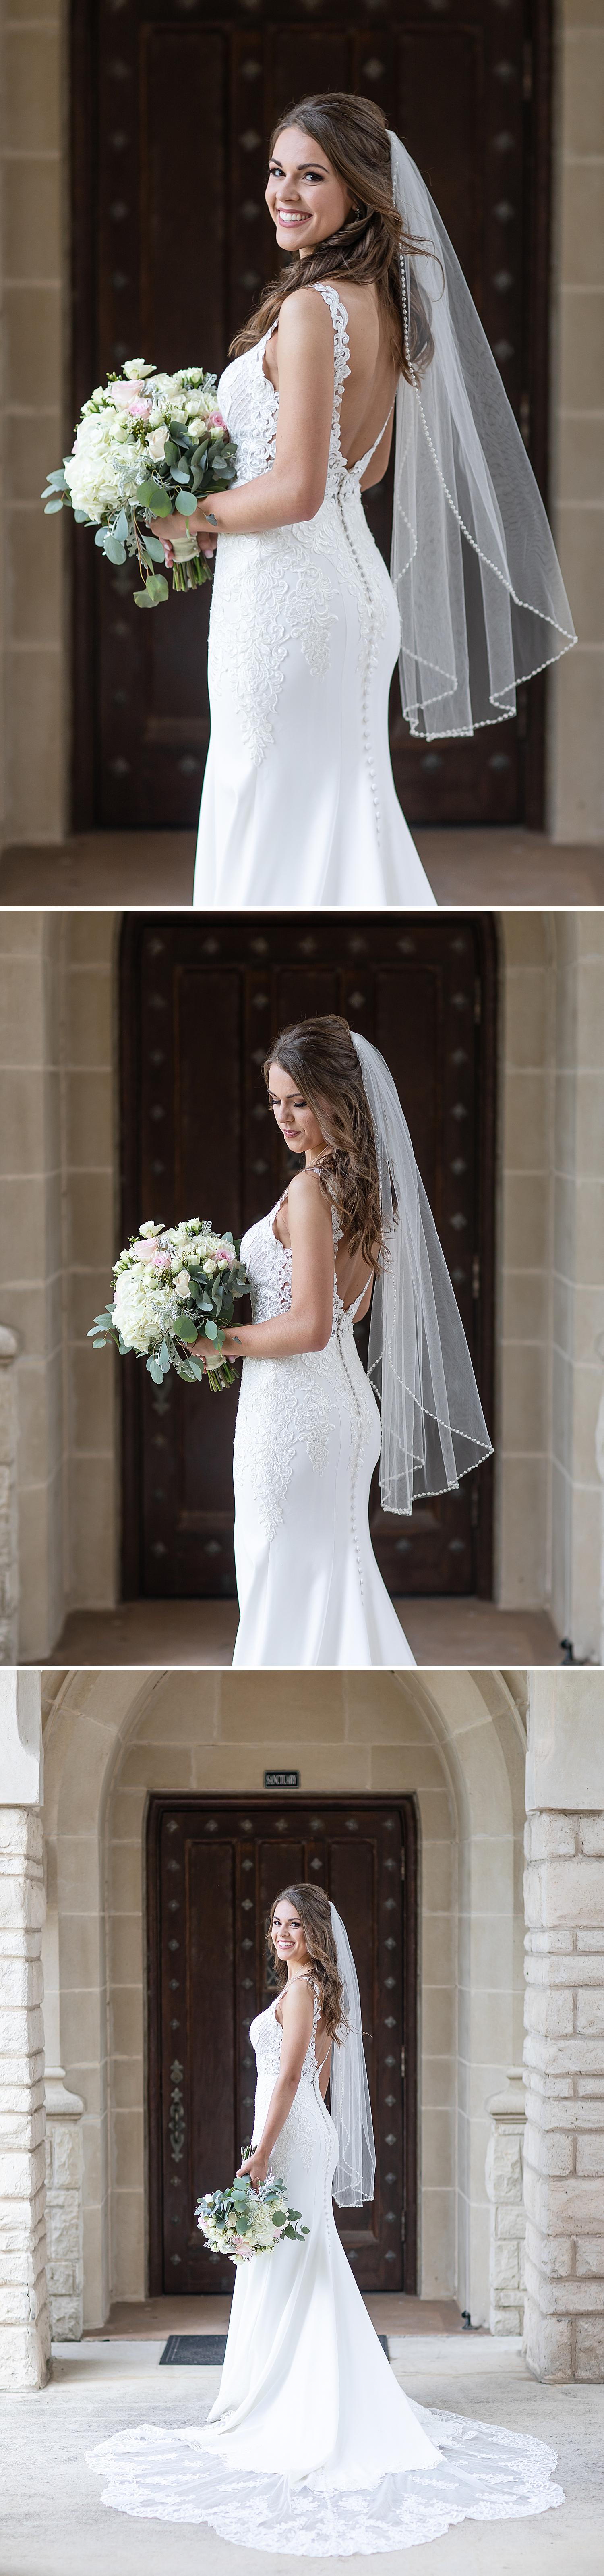 Military-AIr-Force-Wedding-Seguin-LaVernia-Texas-Carly-Barton-Photography_0072.jpg